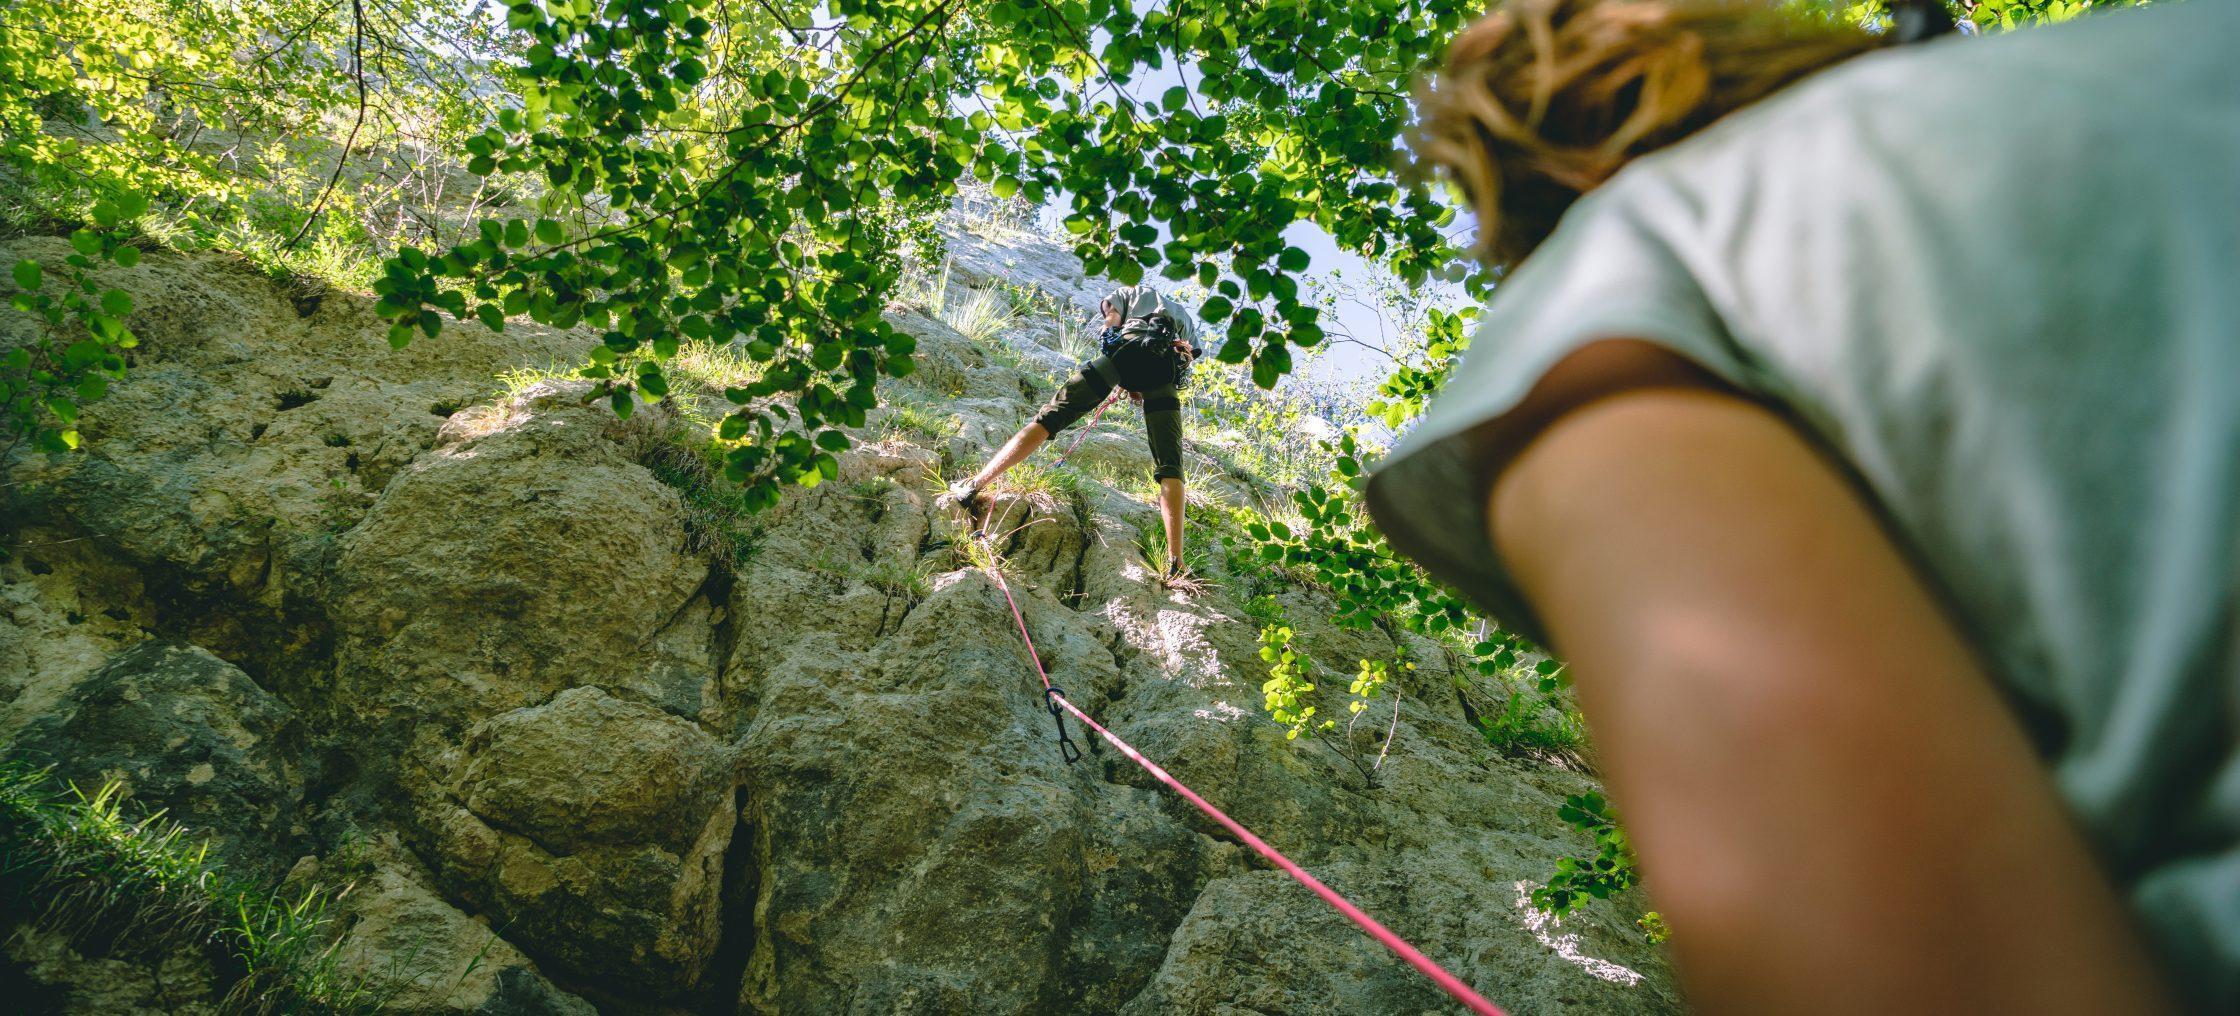 Frau sichert Partner an der Kletterwand - Kanton Jura